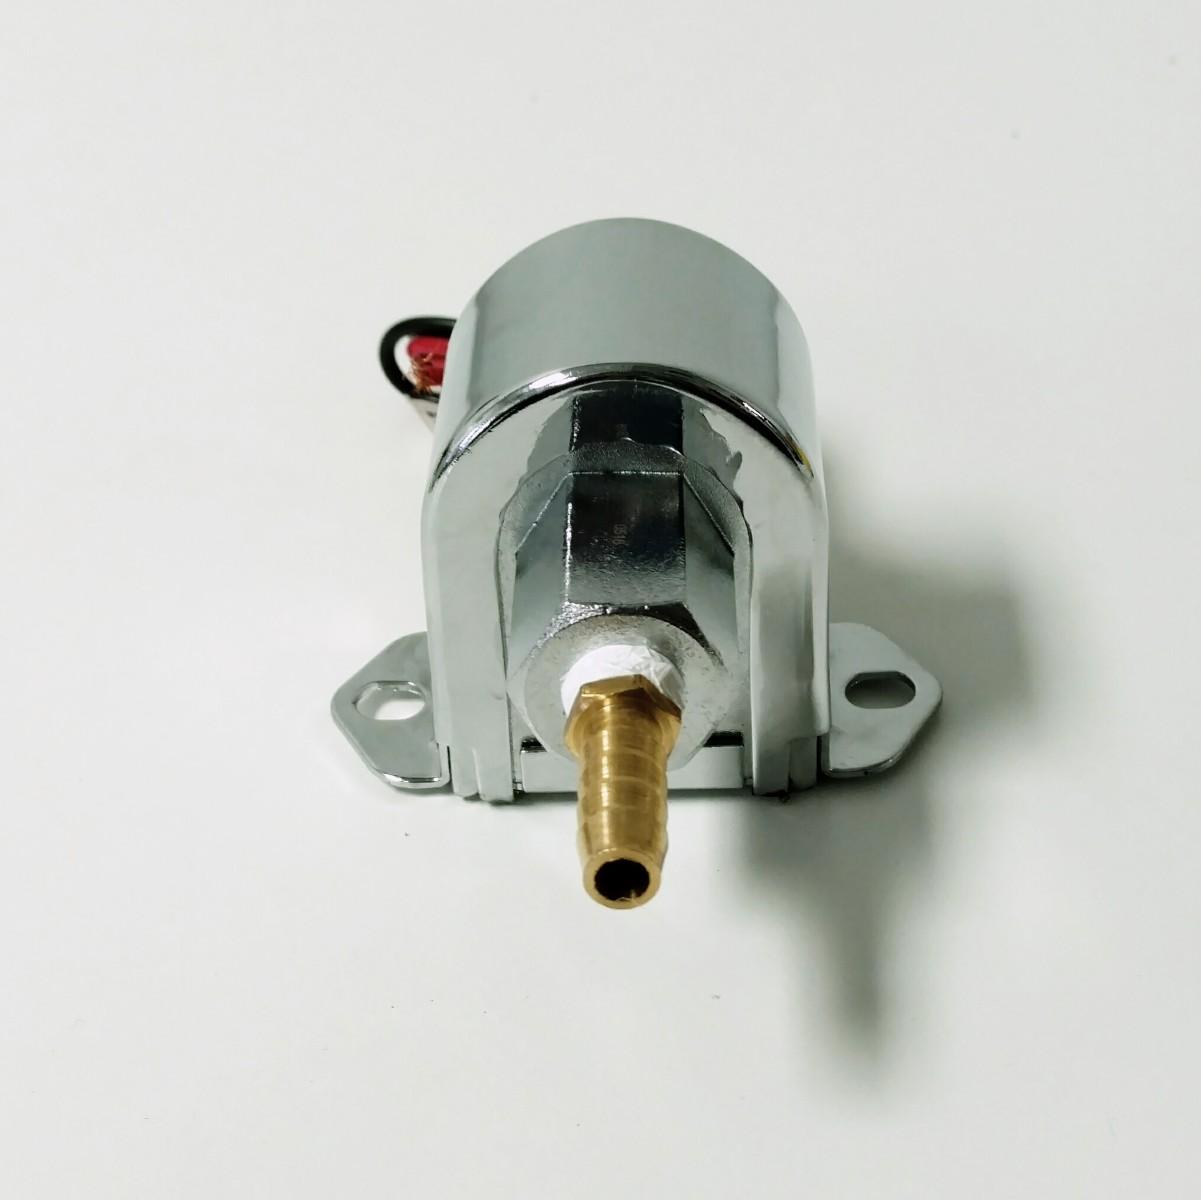 Street Rod Fuel Pump : Universal chrome round electric fuel pump psi hot